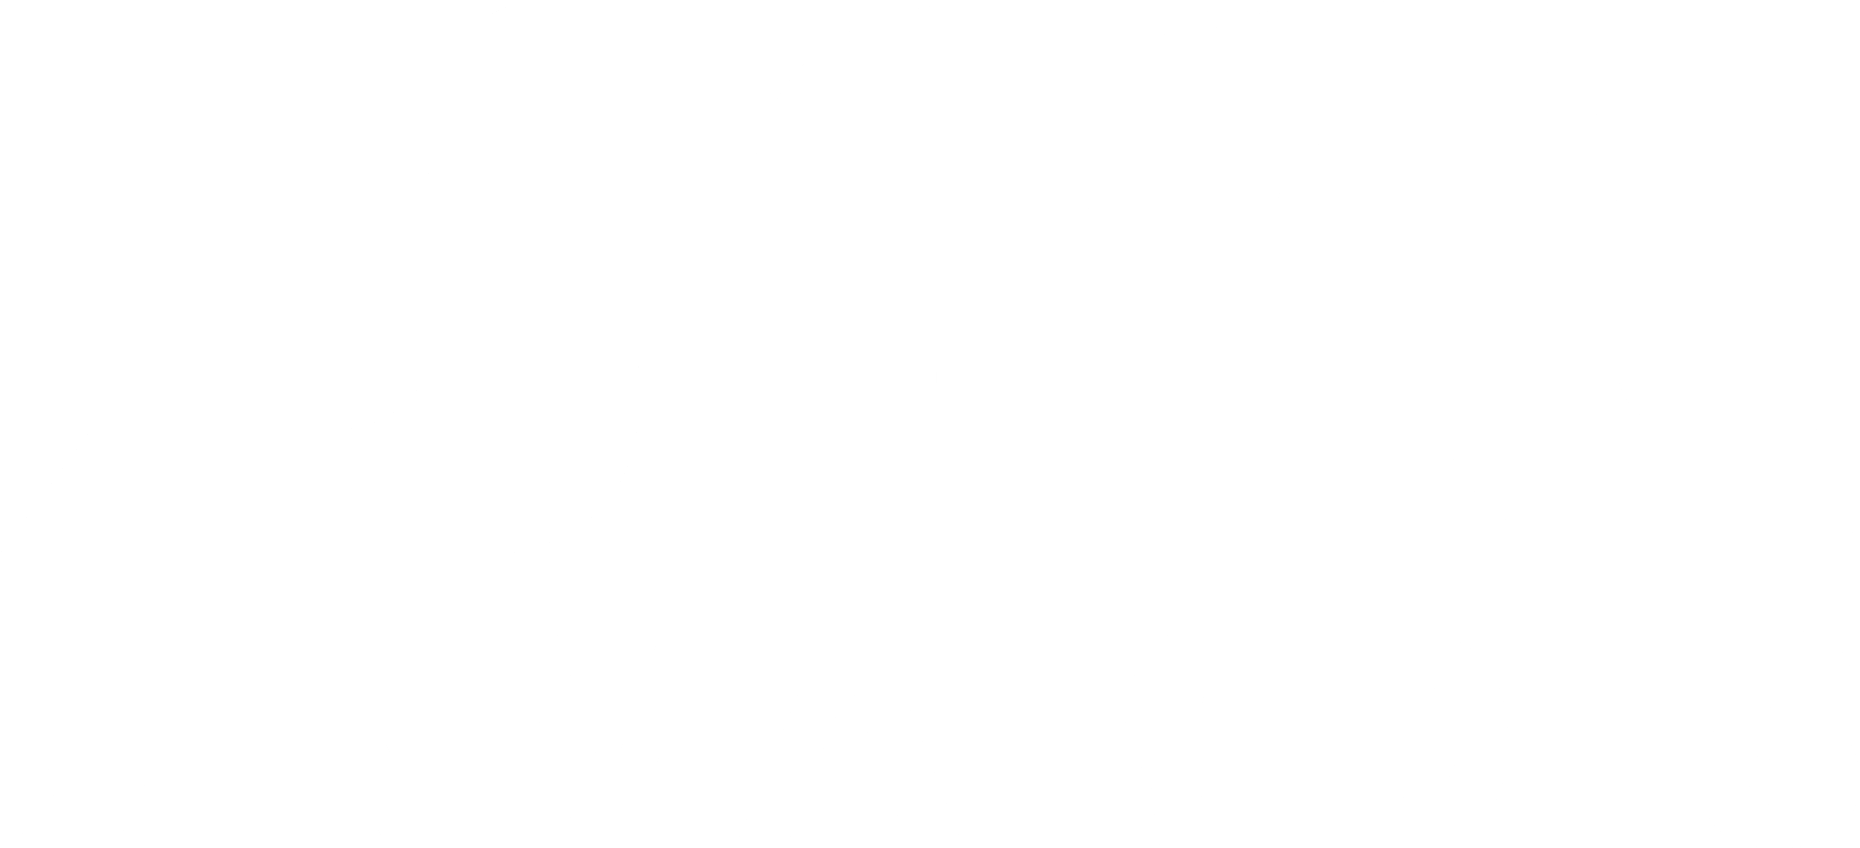 Jinma Rides Array image60